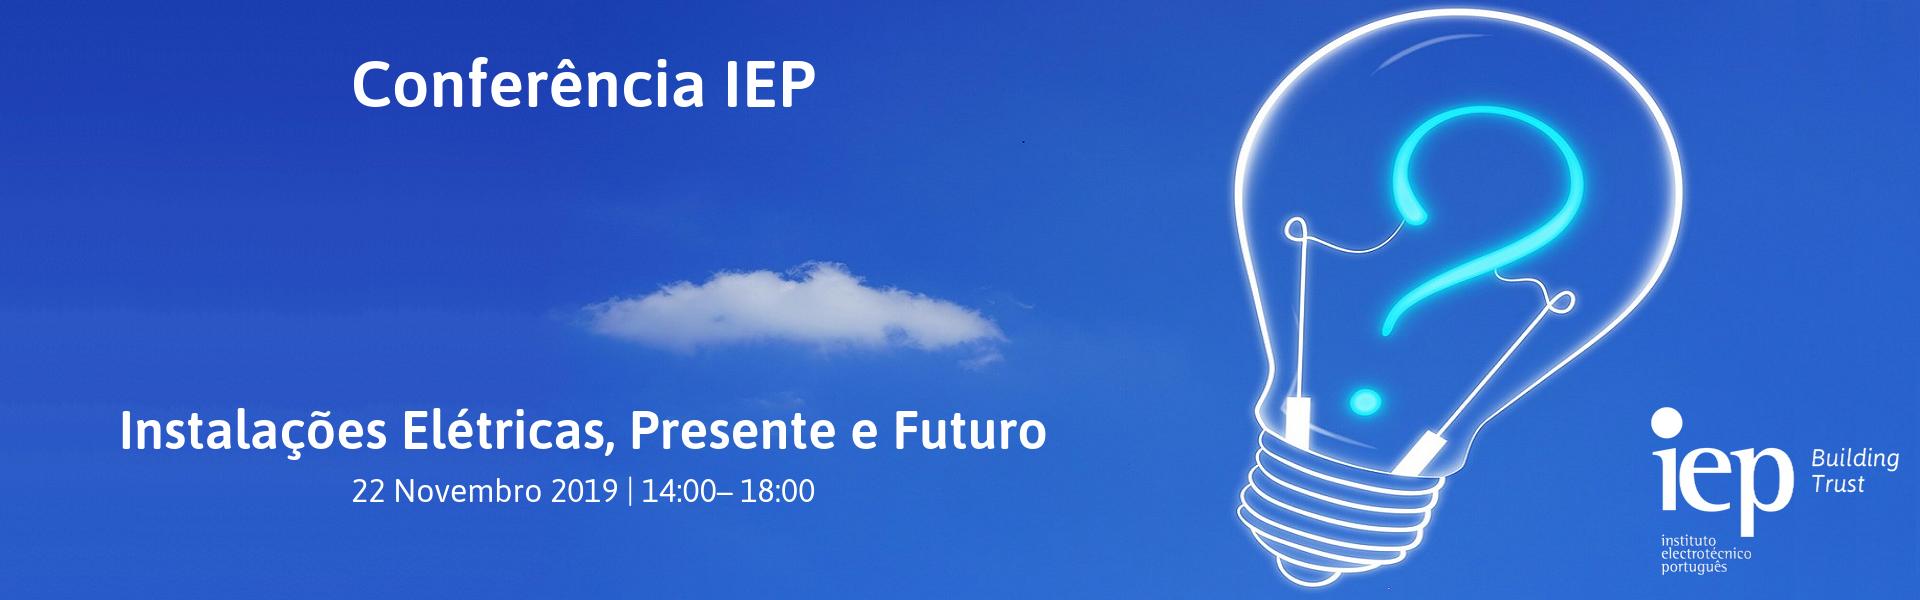 Conferência IEP